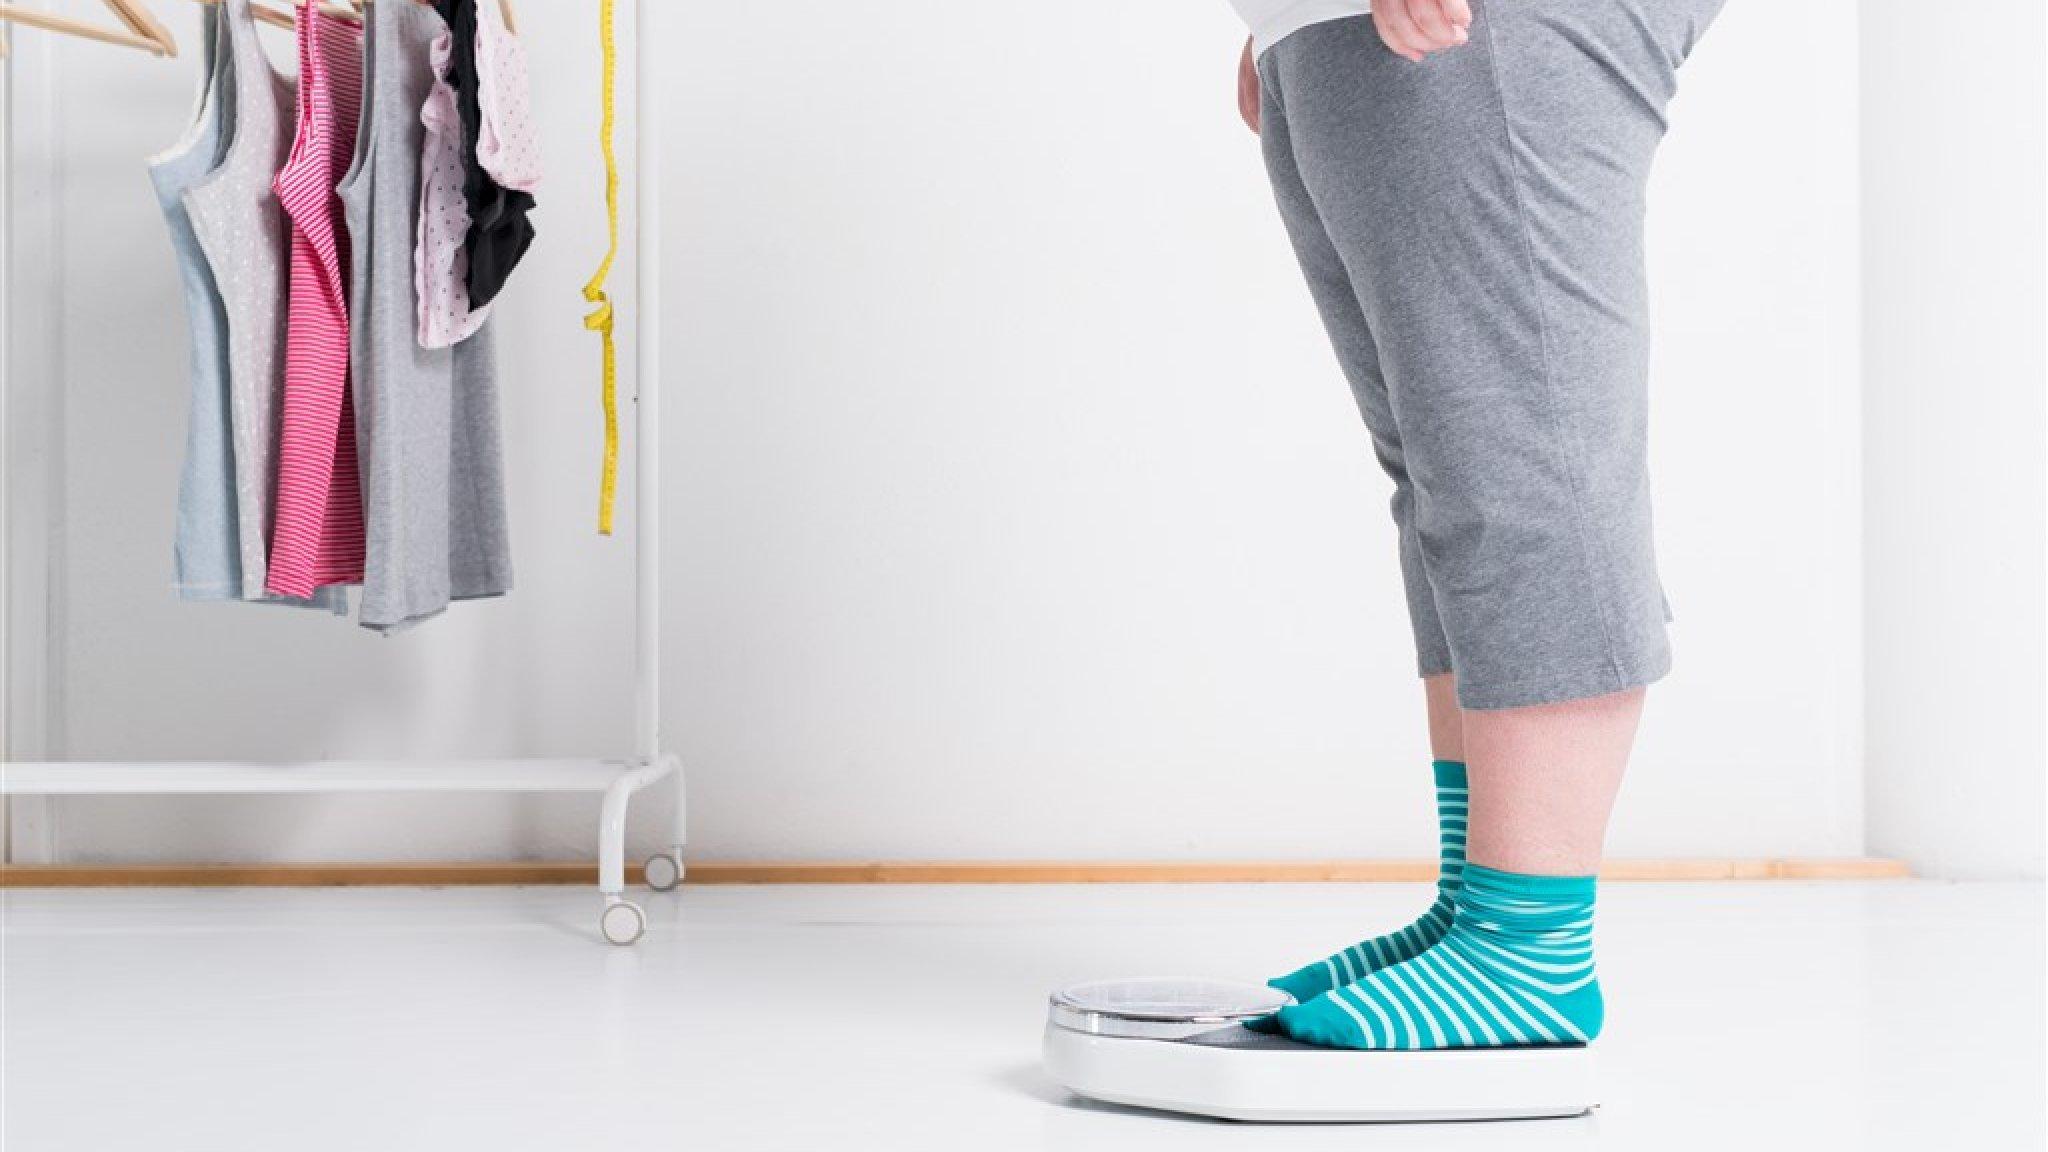 Much misunderstanding about obesity, not just a 'diet'